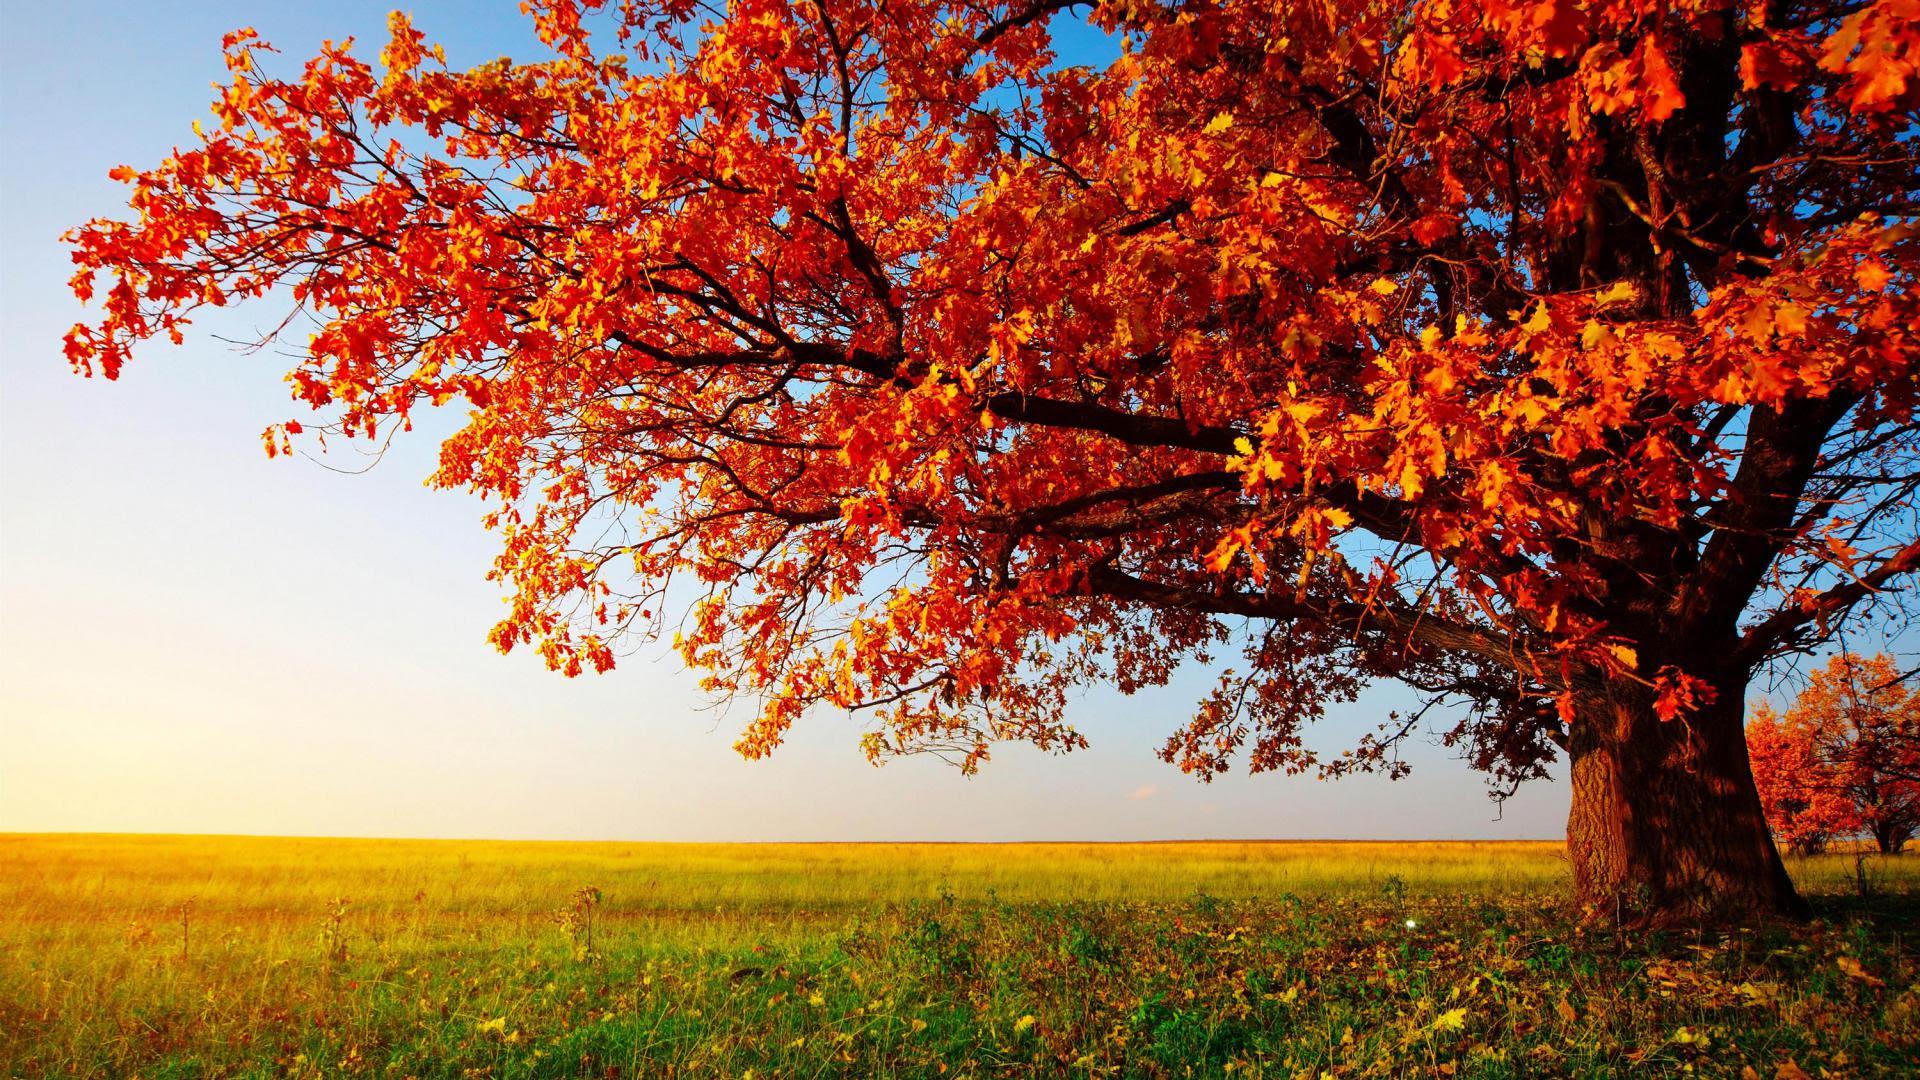 Free Desktop Wallpaper HD - ITC Sales Blog